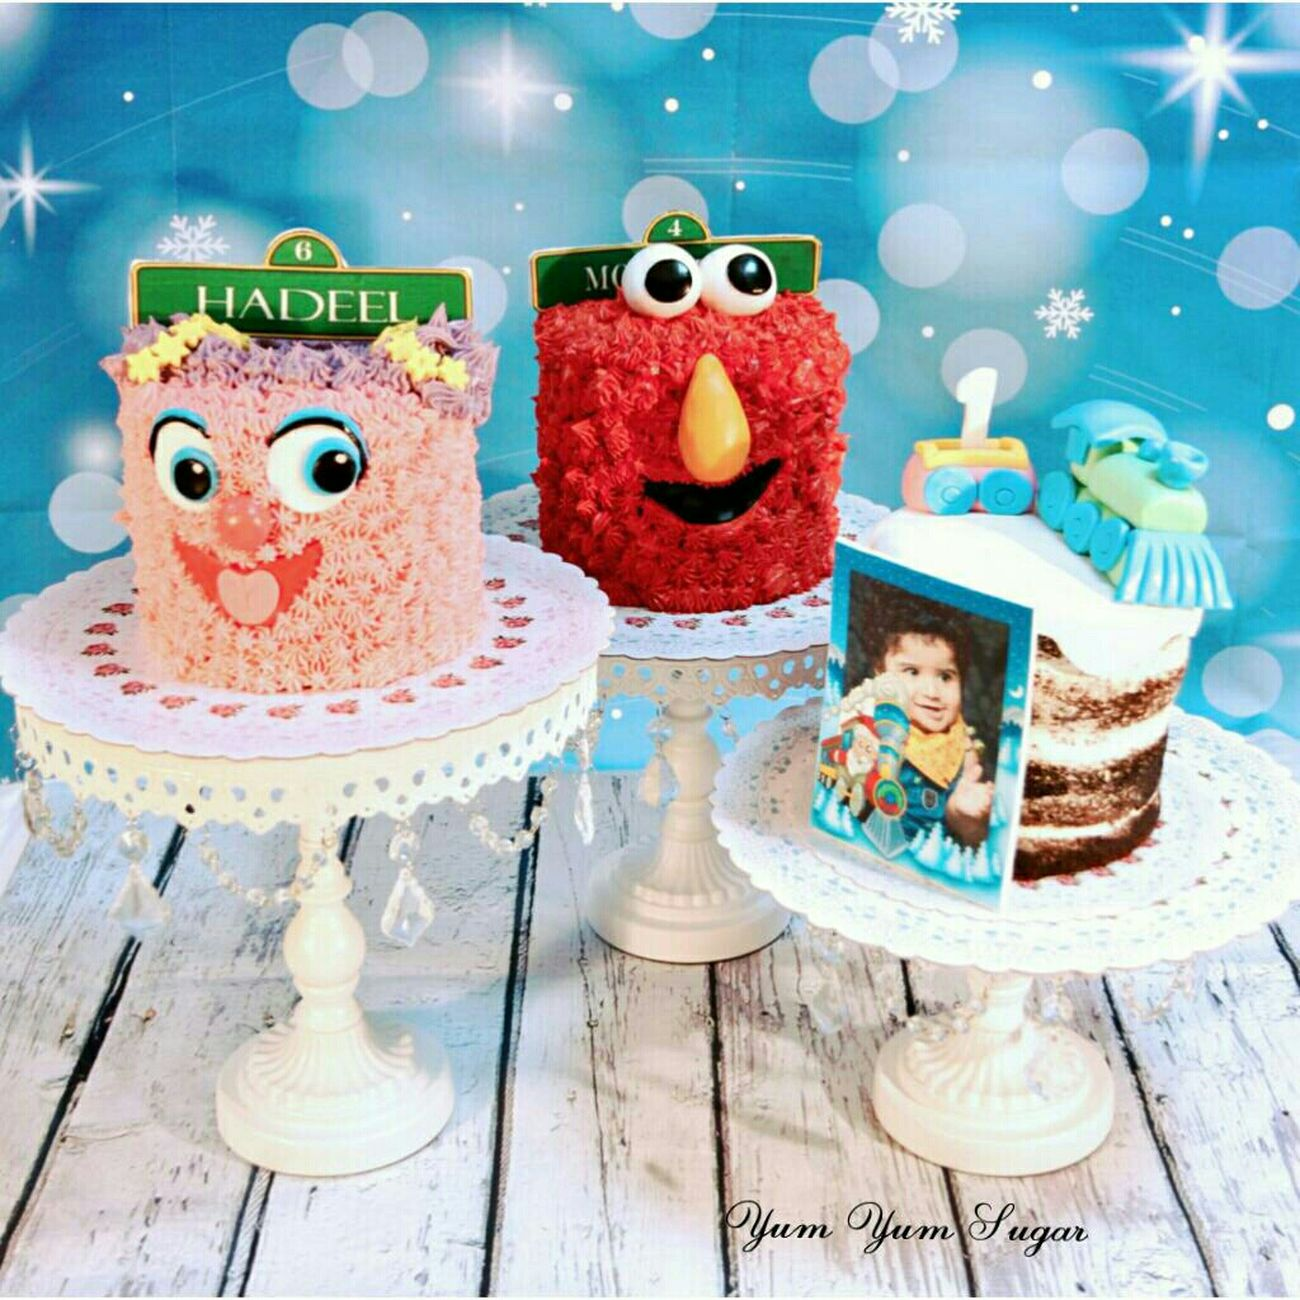 Elmo Sweets Food Cake Art Abby Cadabby Al Qatif Safwa Sesame Street Cool